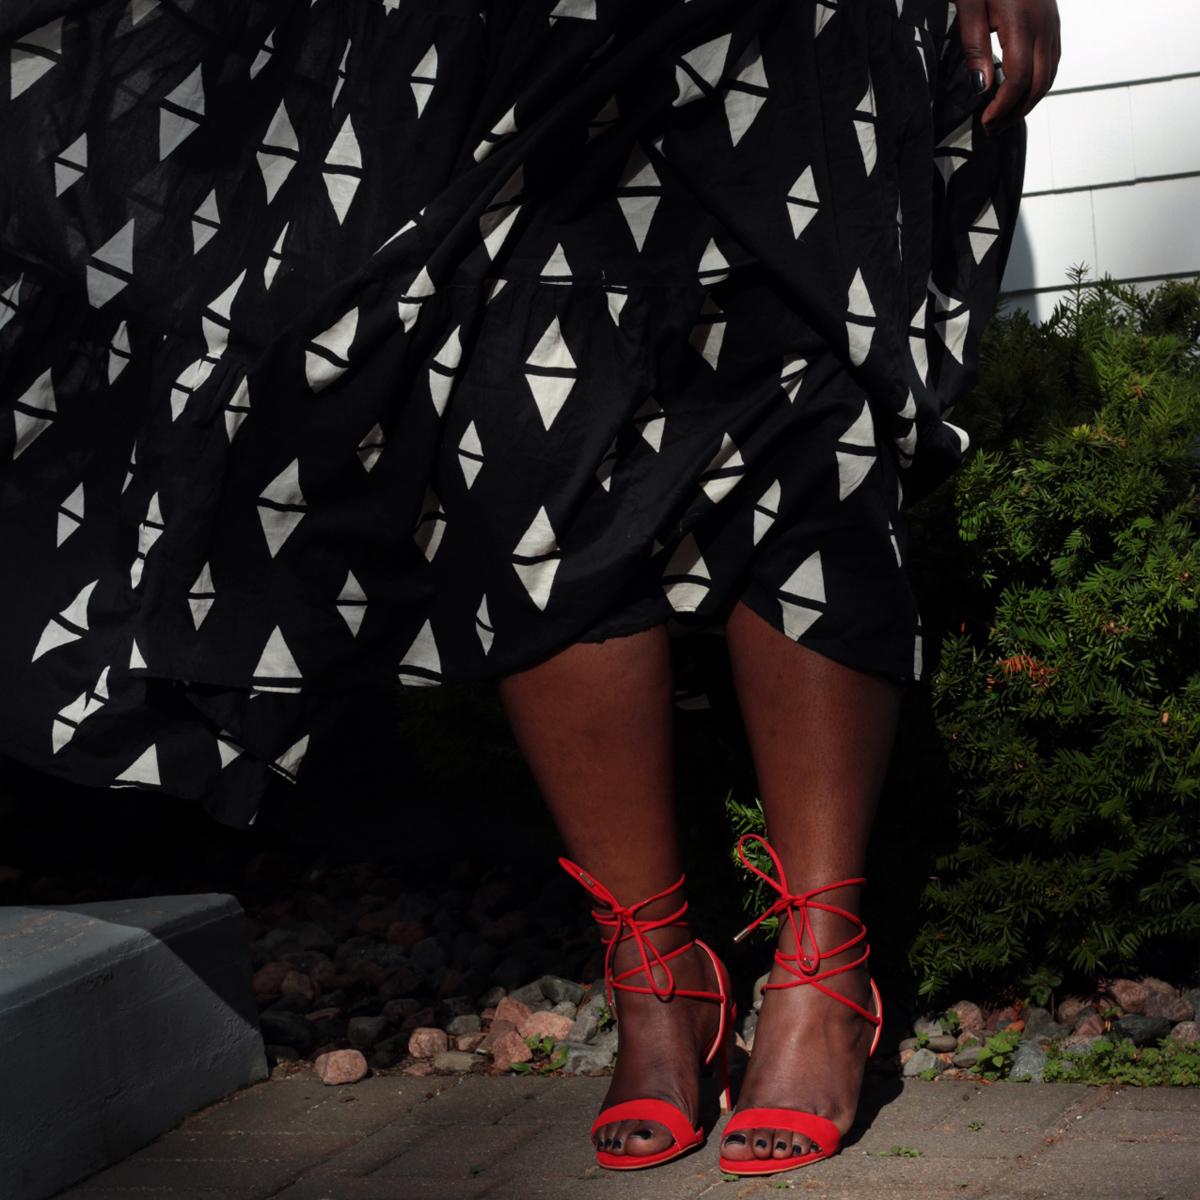 plus-size-style-plus-size-maxi-dress-04